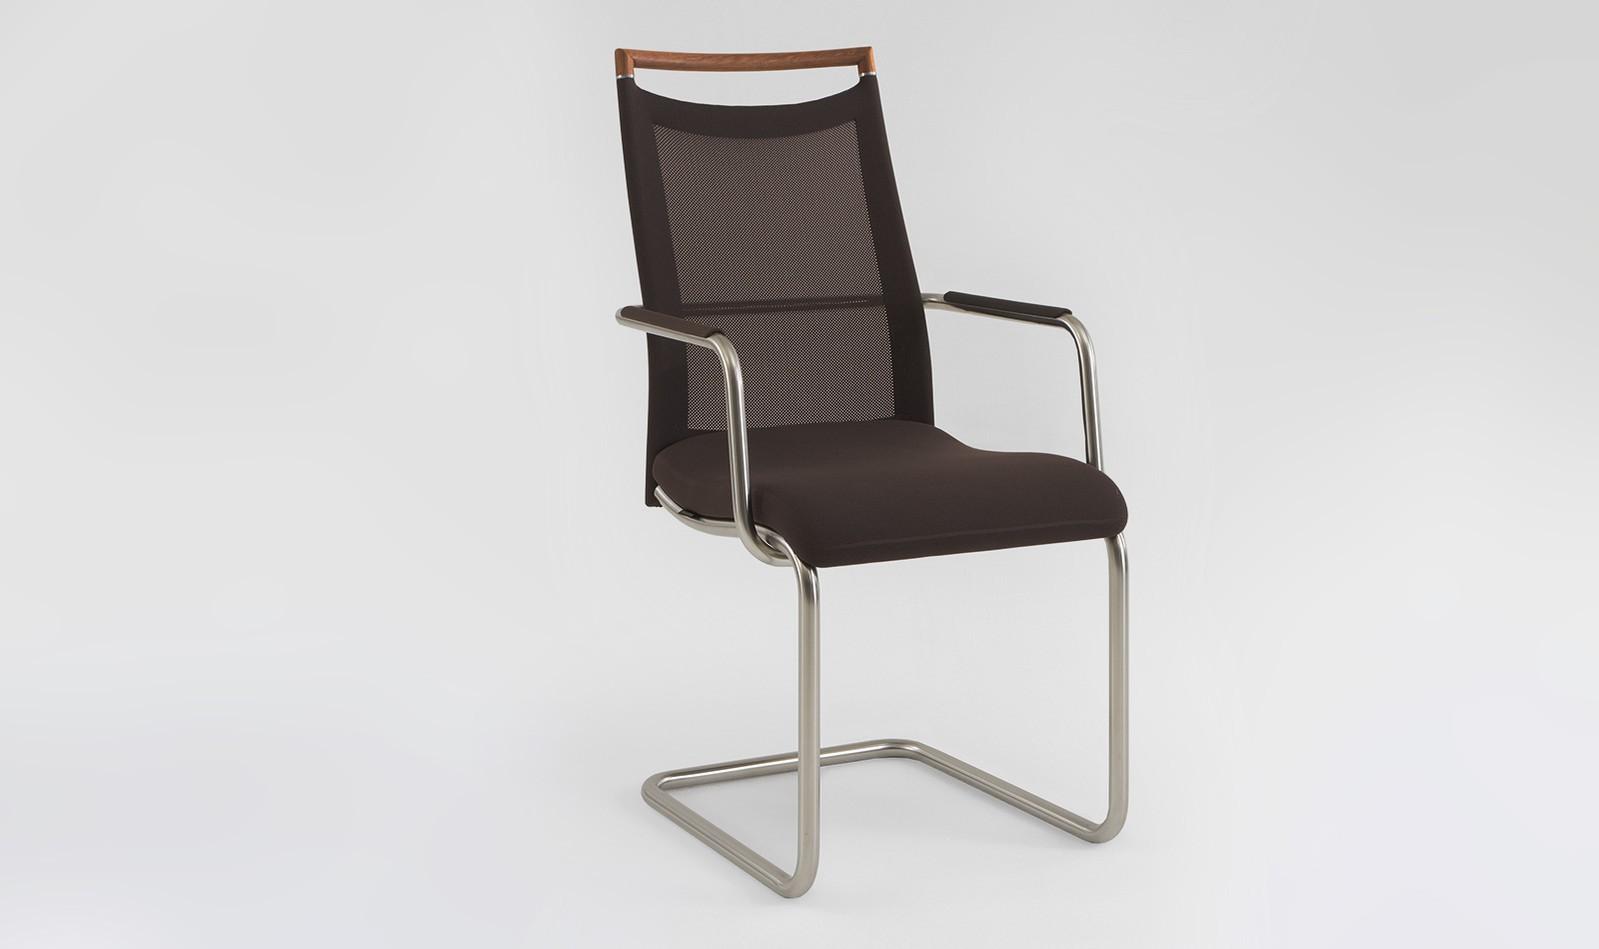 venjakob stuhl sessel joy 0486 16 tritex metall verchromt. Black Bedroom Furniture Sets. Home Design Ideas